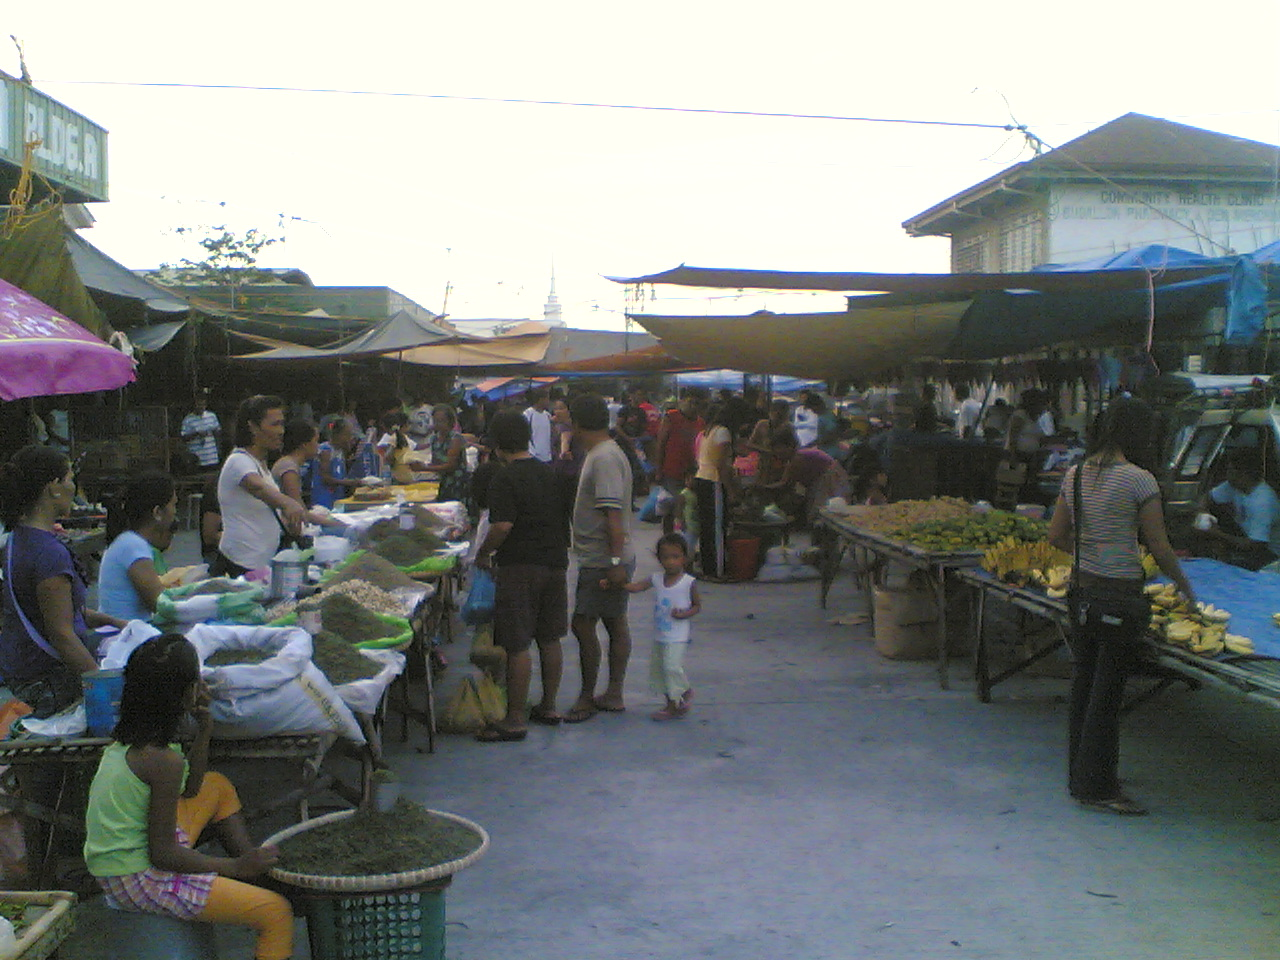 carinderia sanitation Blue carabao diner: davao carinderia - see 36 traveler reviews, 19 candid photos, and great deals for davao city, philippines, at tripadvisor.